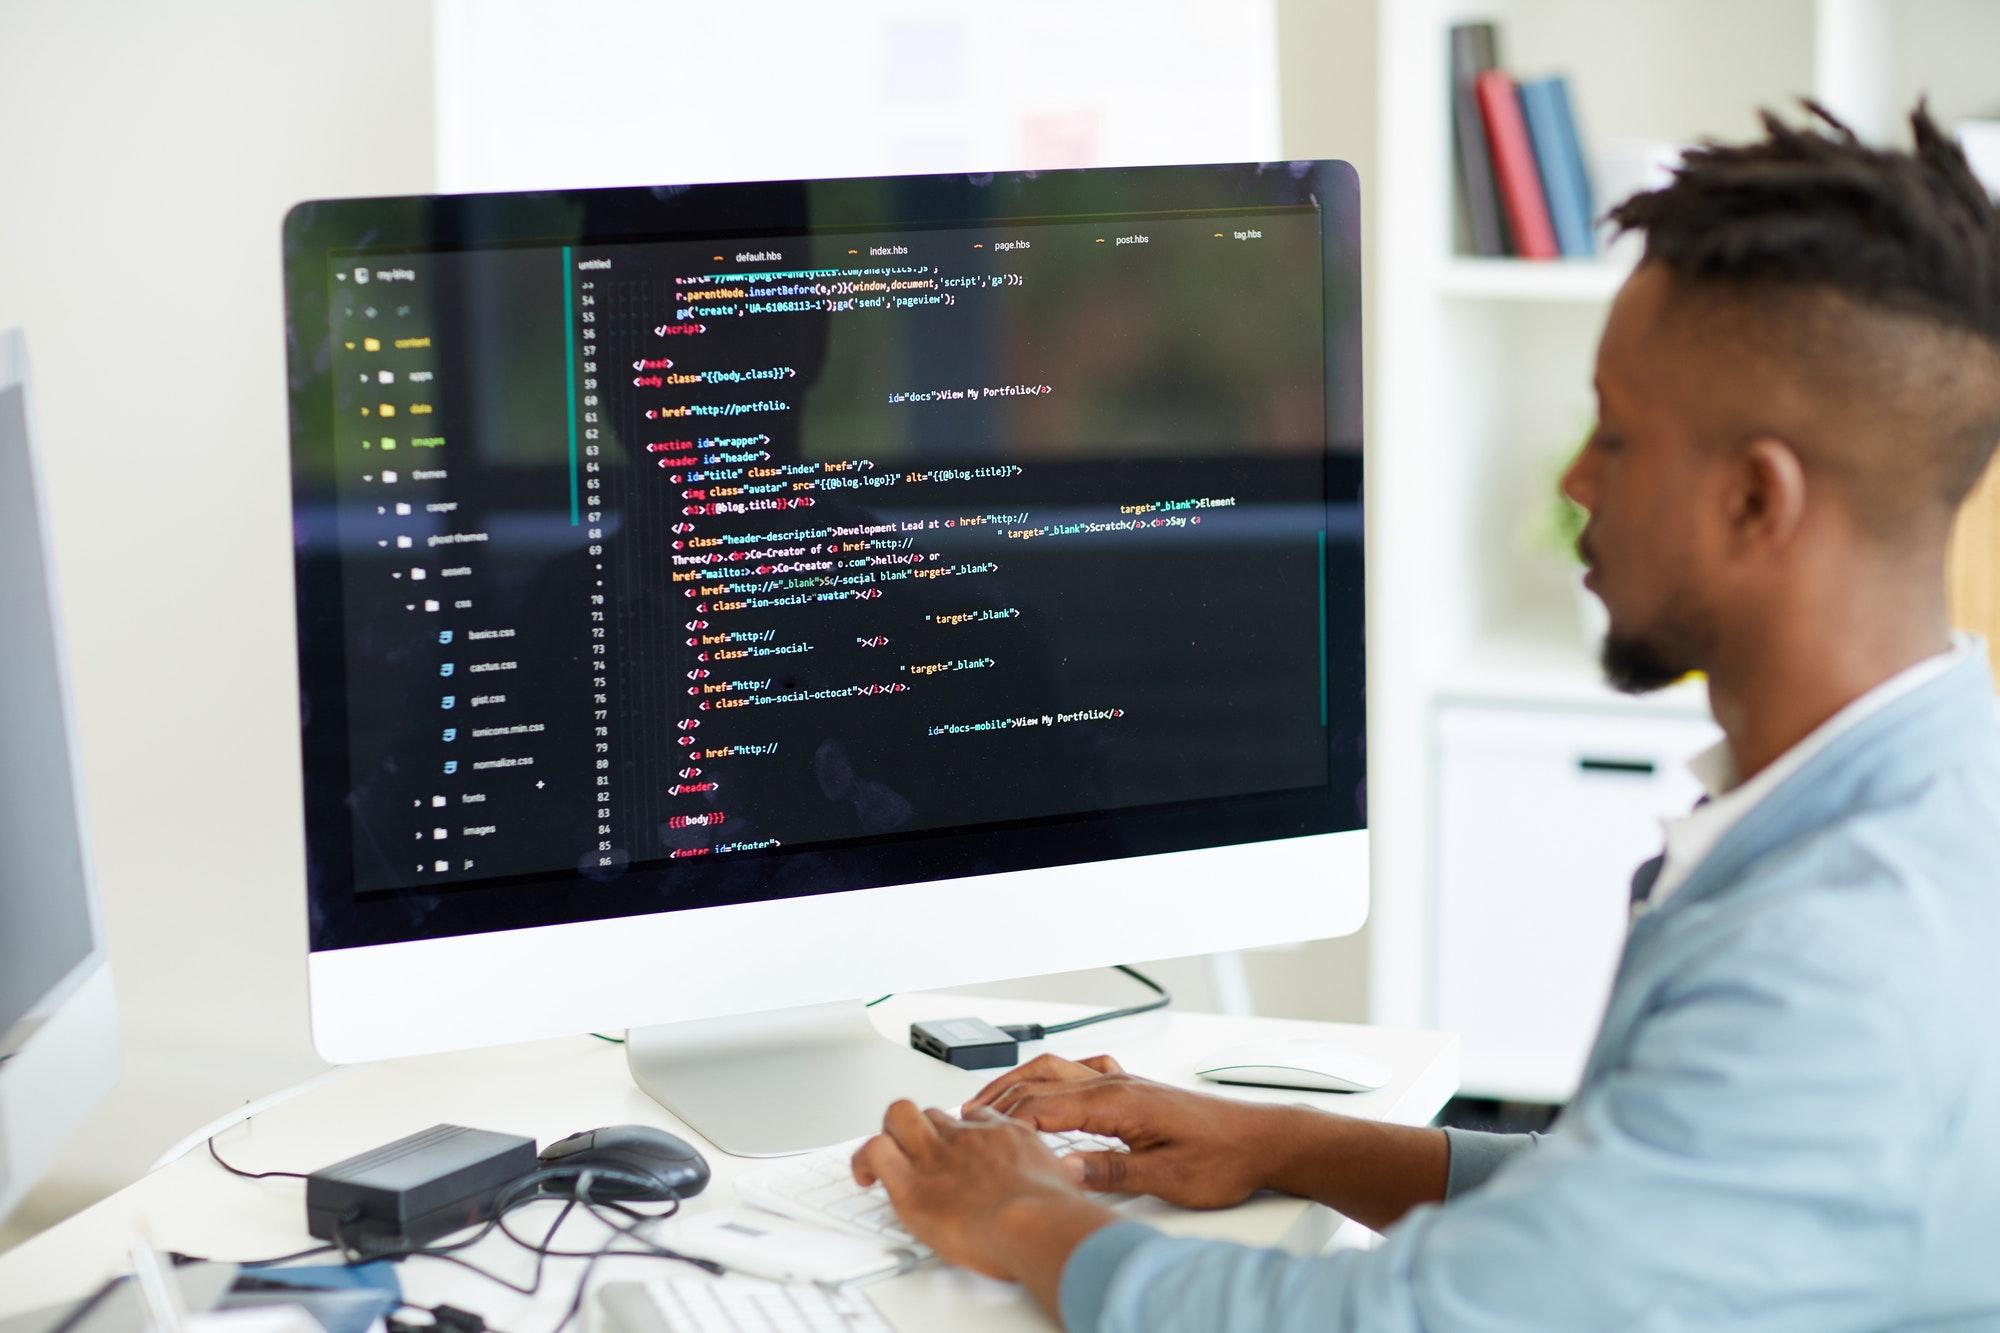 Web developer coding computer language